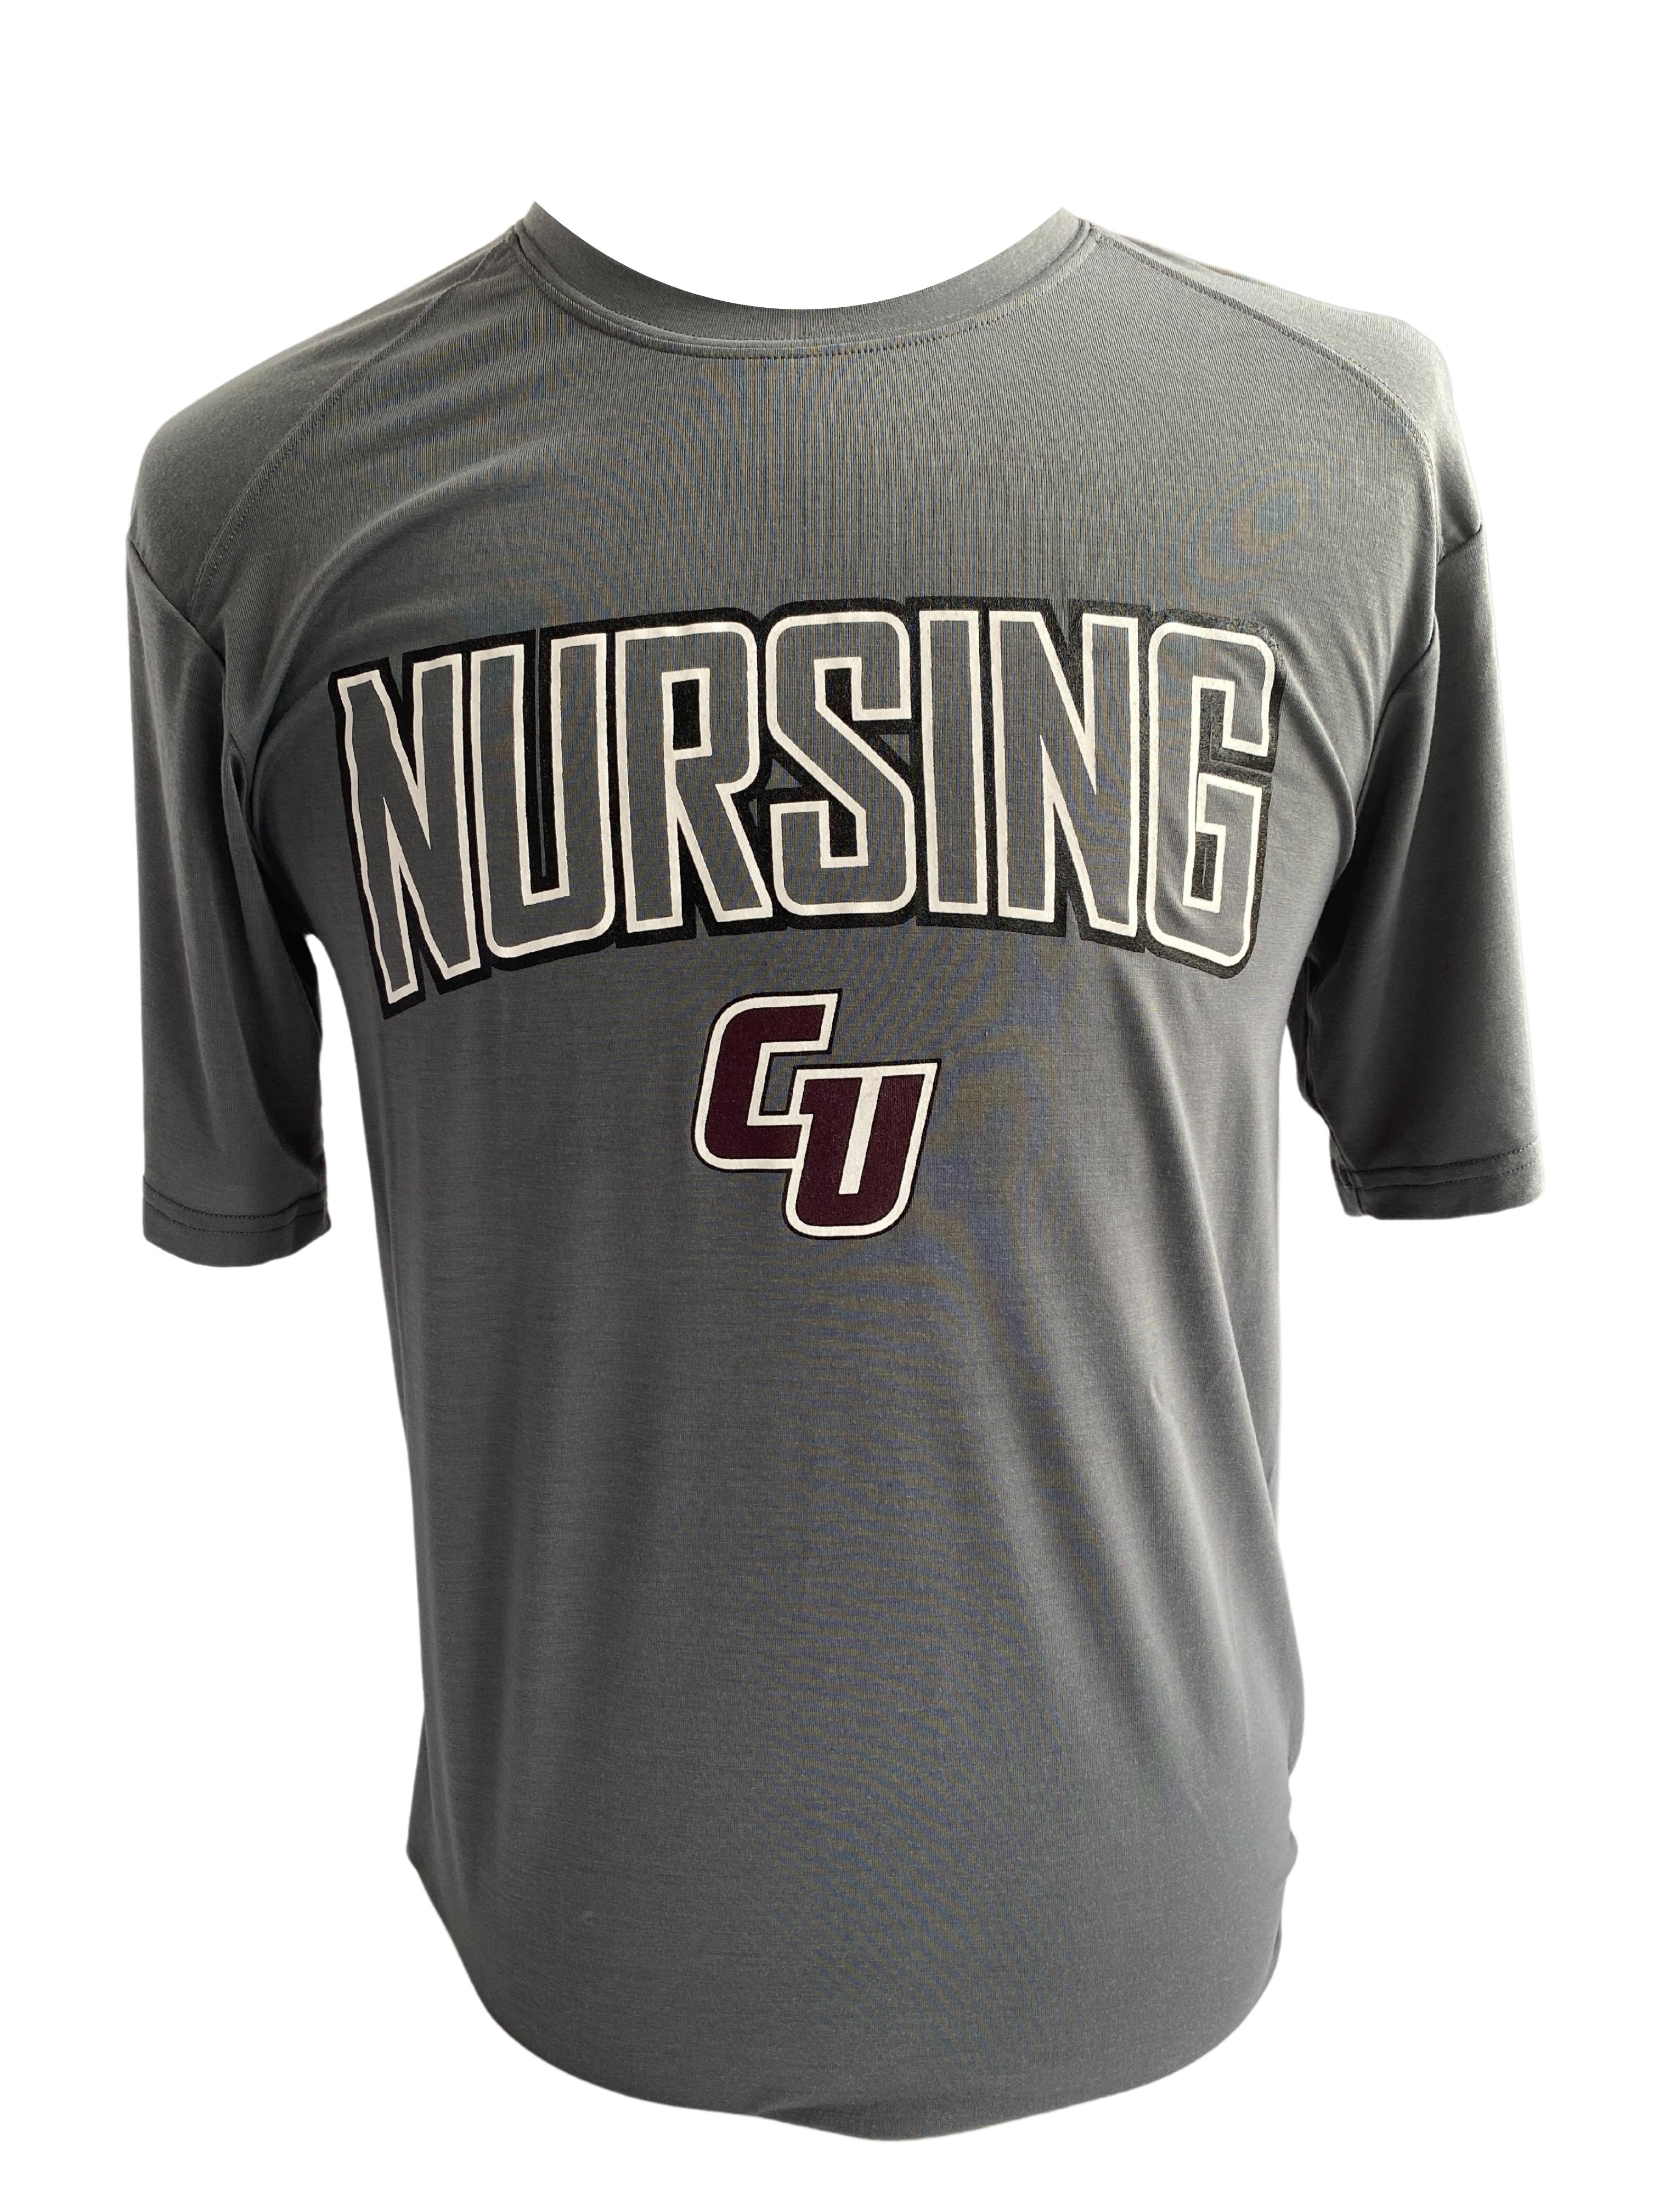 Nursing CU B-Tech Shirt